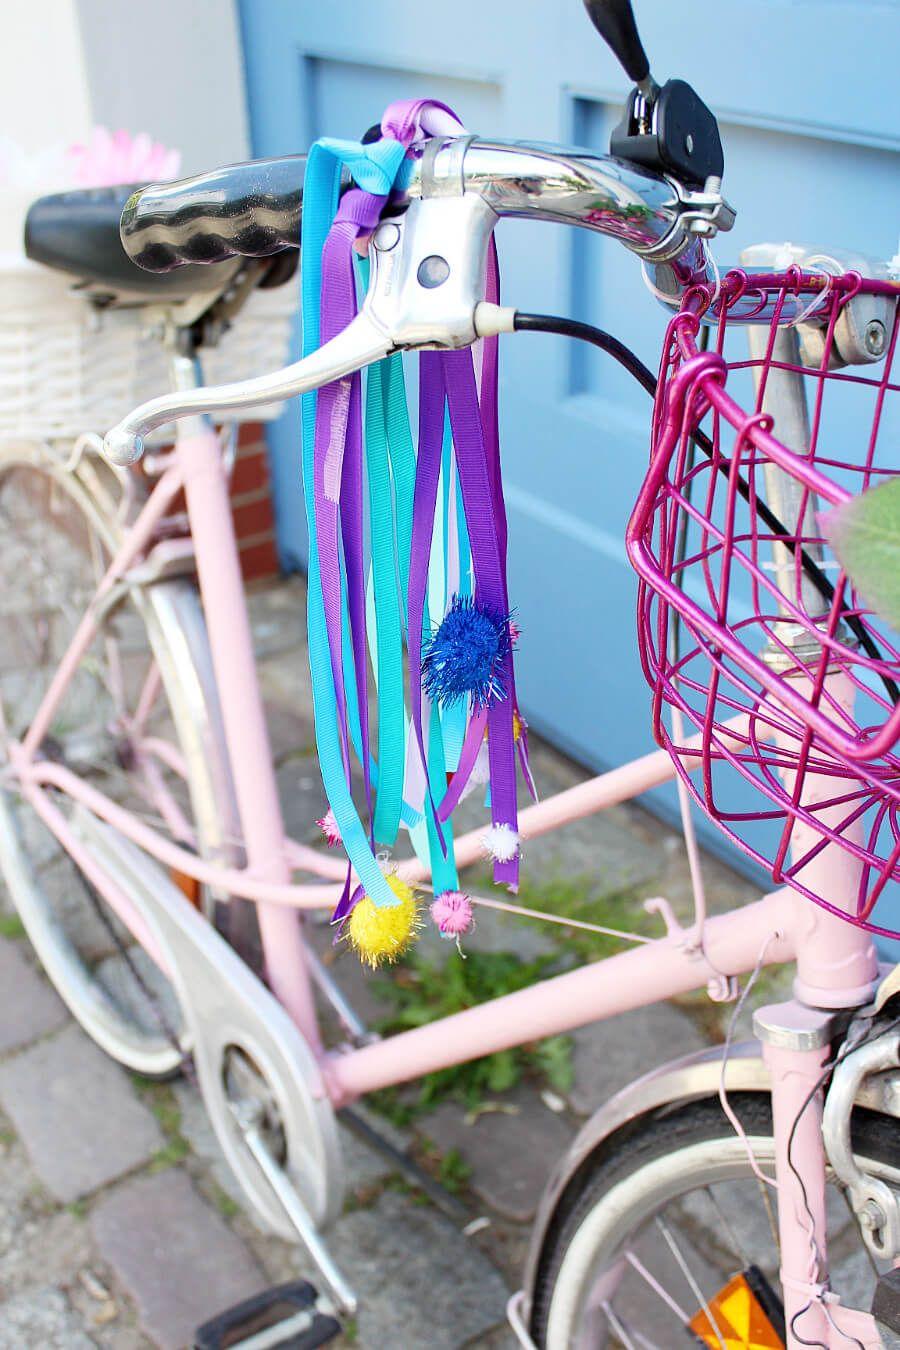 diy fahrrad upcyceln 4 geniale ideen um dein fahrrad. Black Bedroom Furniture Sets. Home Design Ideas